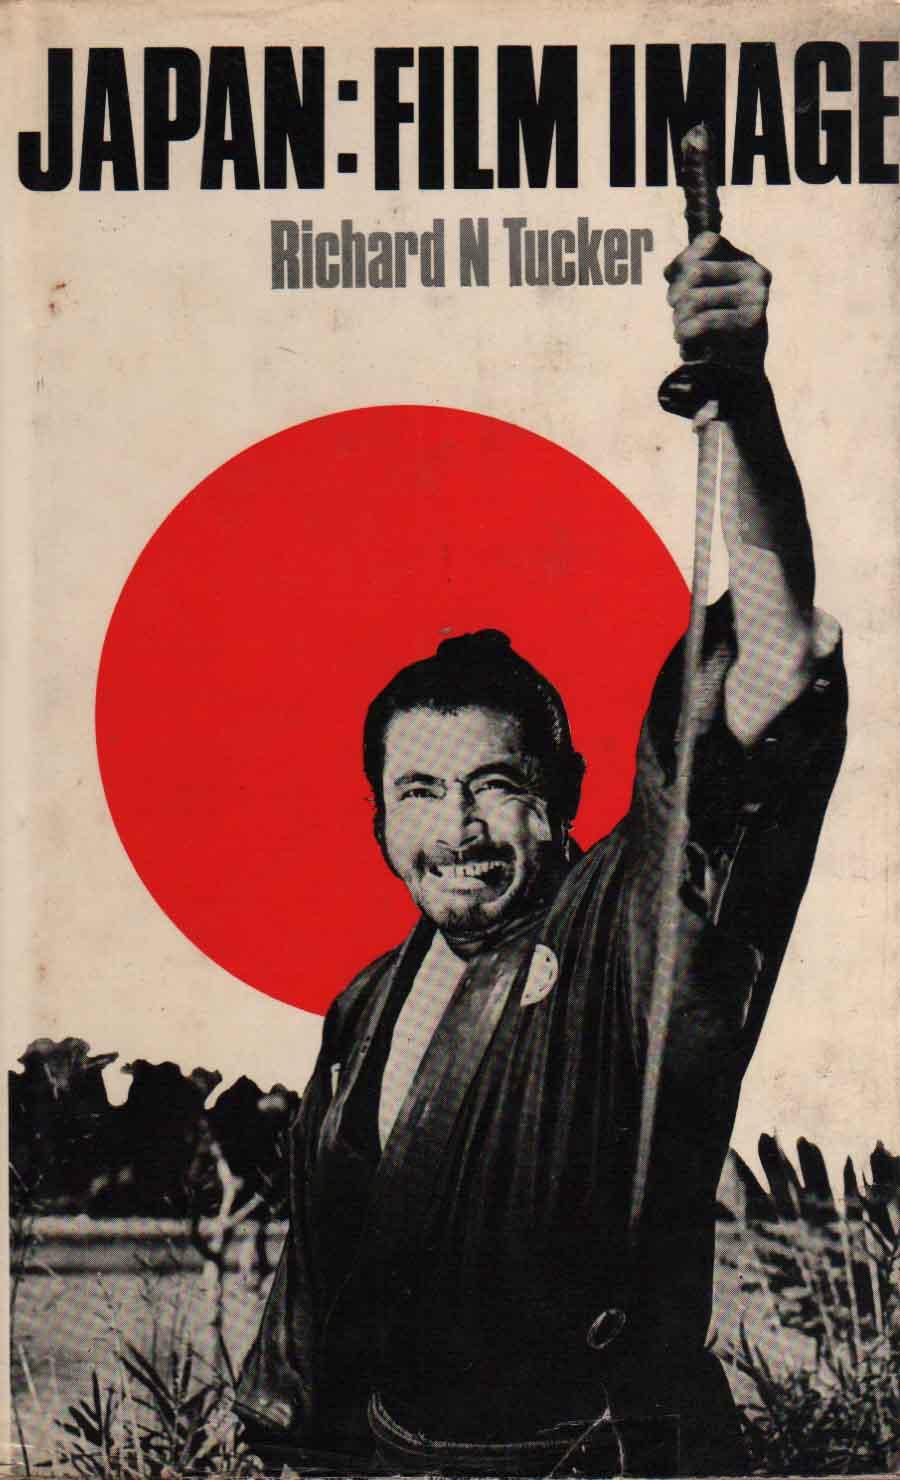 Japan - film image